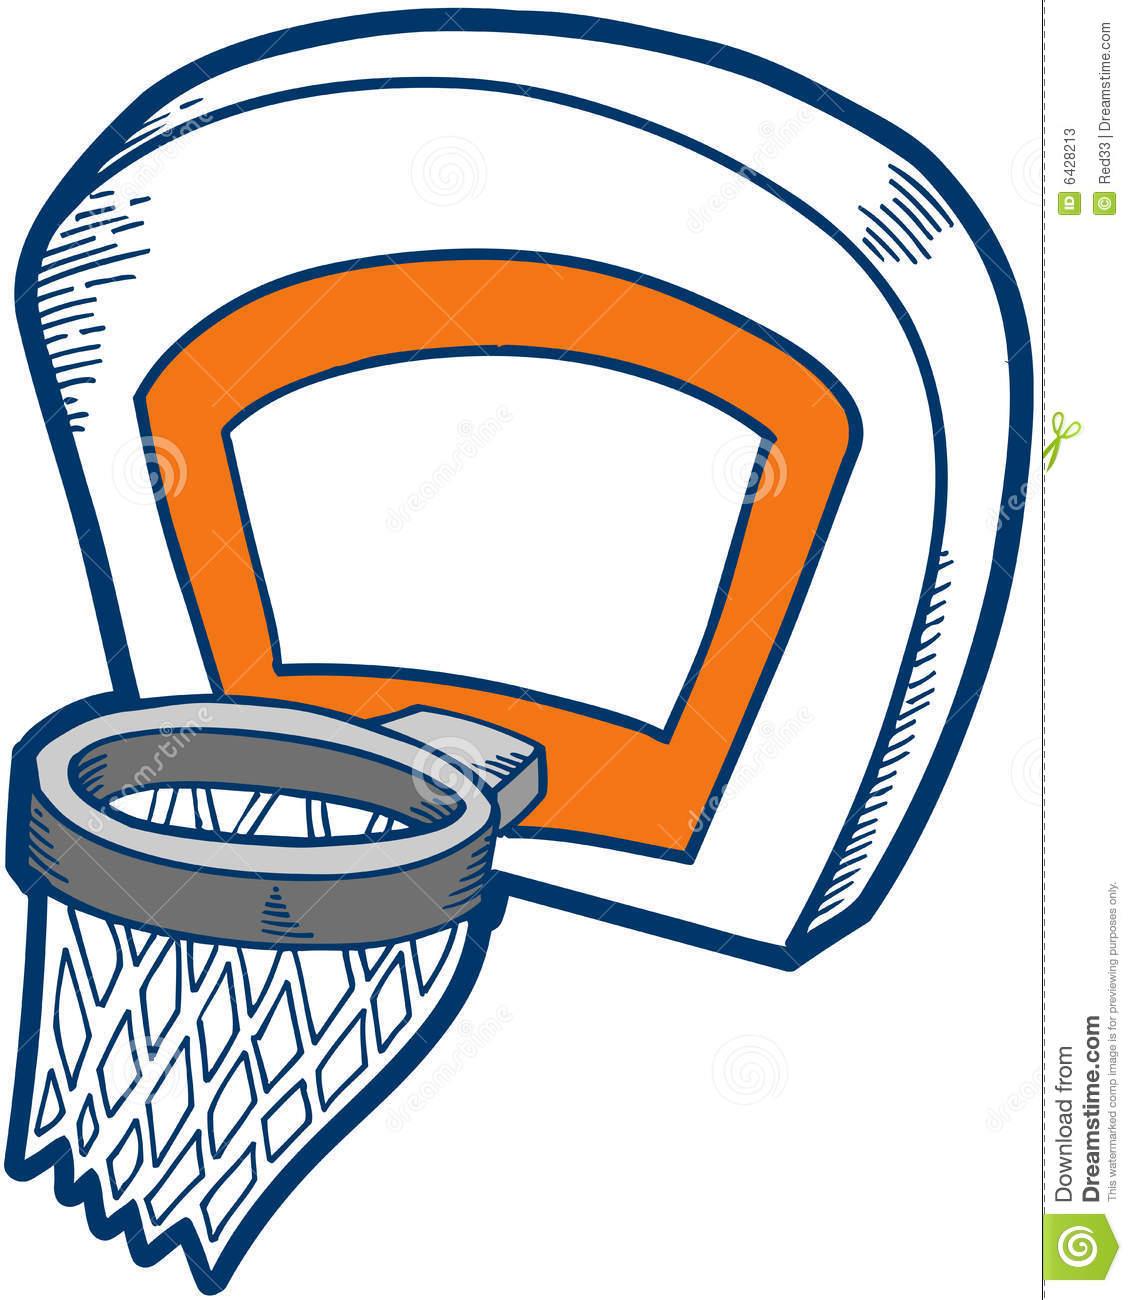 basketball hoop clipart clipart panda free clipart images basketball hoop clip art free images basketball hoop clip art free images